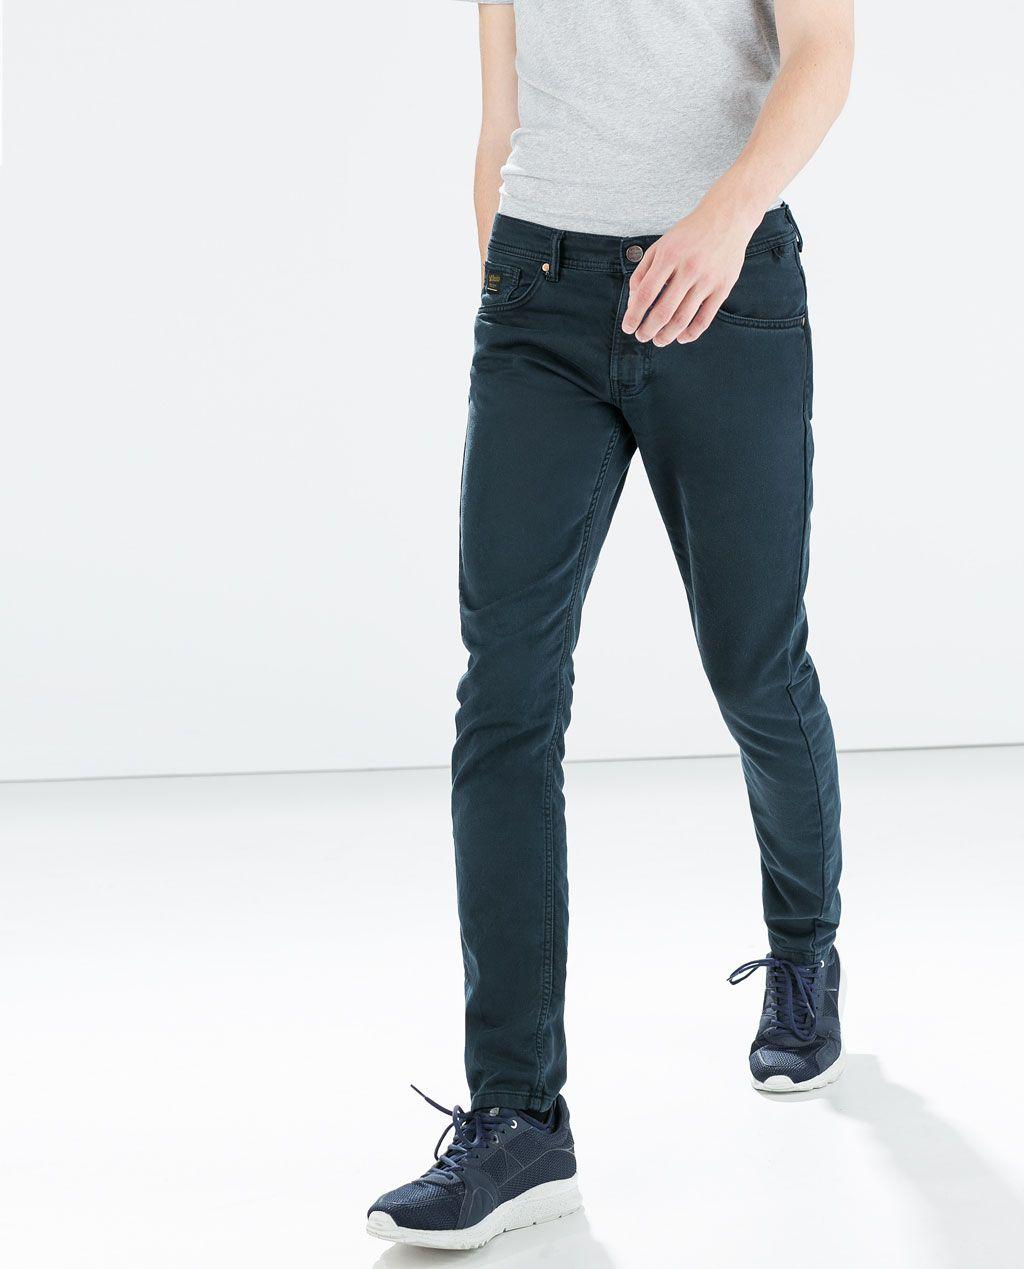 Zara Man Soft Denim Jeans Stuff To Buy Pinterest Menswear